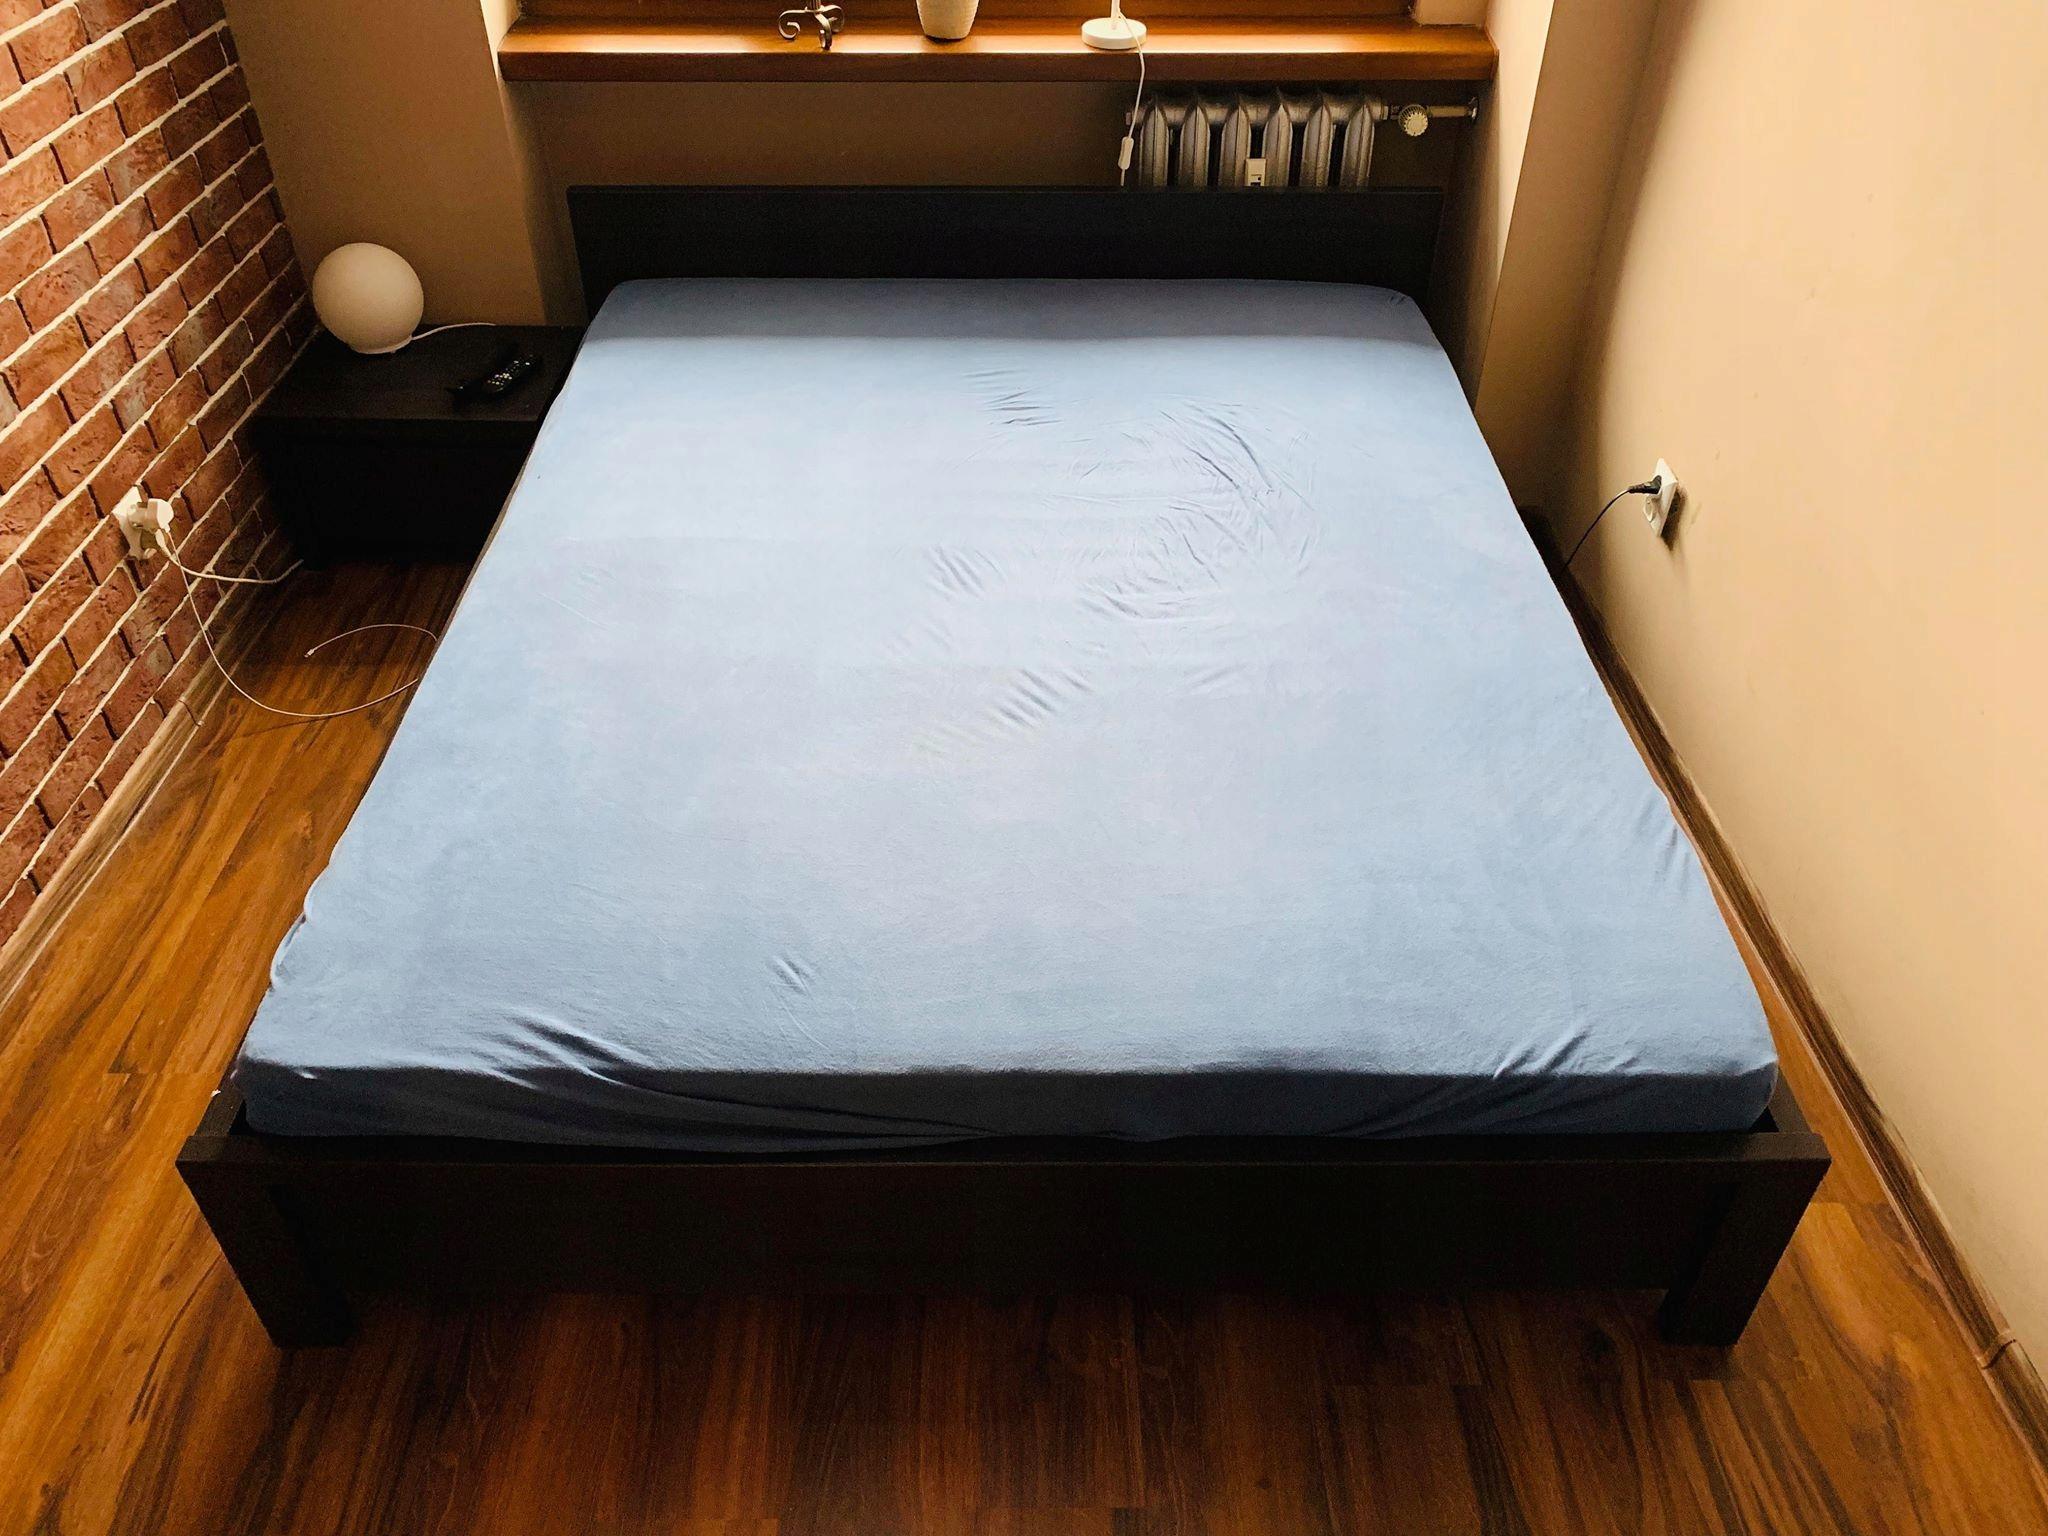 łóżko Sypialniane Agata Meble Materac 8098094730